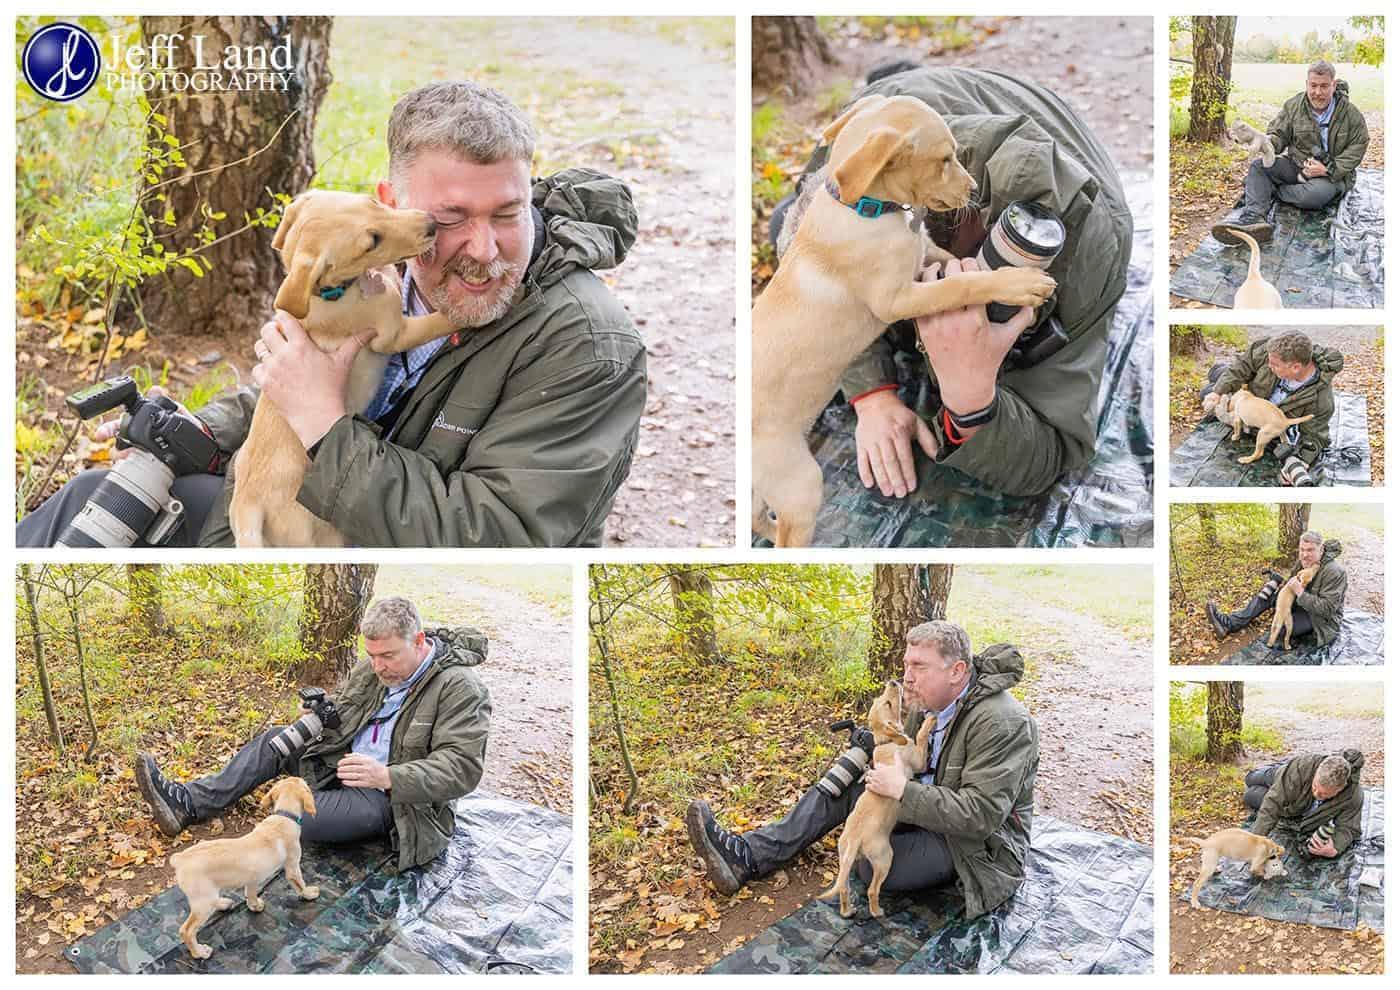 Dog Portrait Photographer, Stratford upon Avon, Warwickshire, Cotswolds, Pet Portrait. Photography, Photographer, Jeff Land